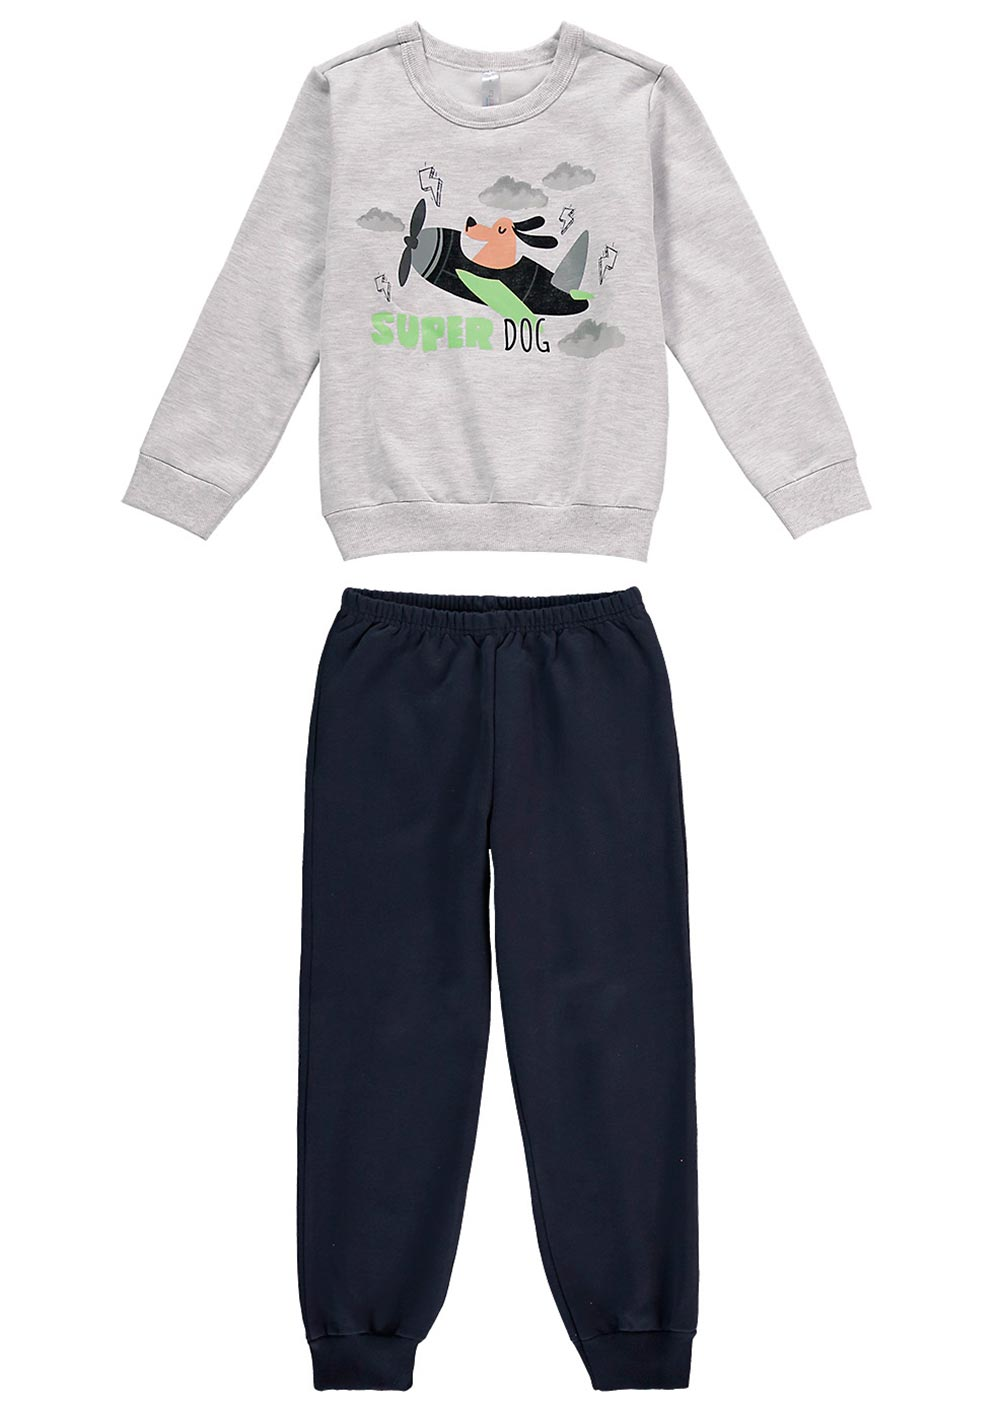 Pijama Infantil Masculino Inverno Cinza Super Dog - Malwee